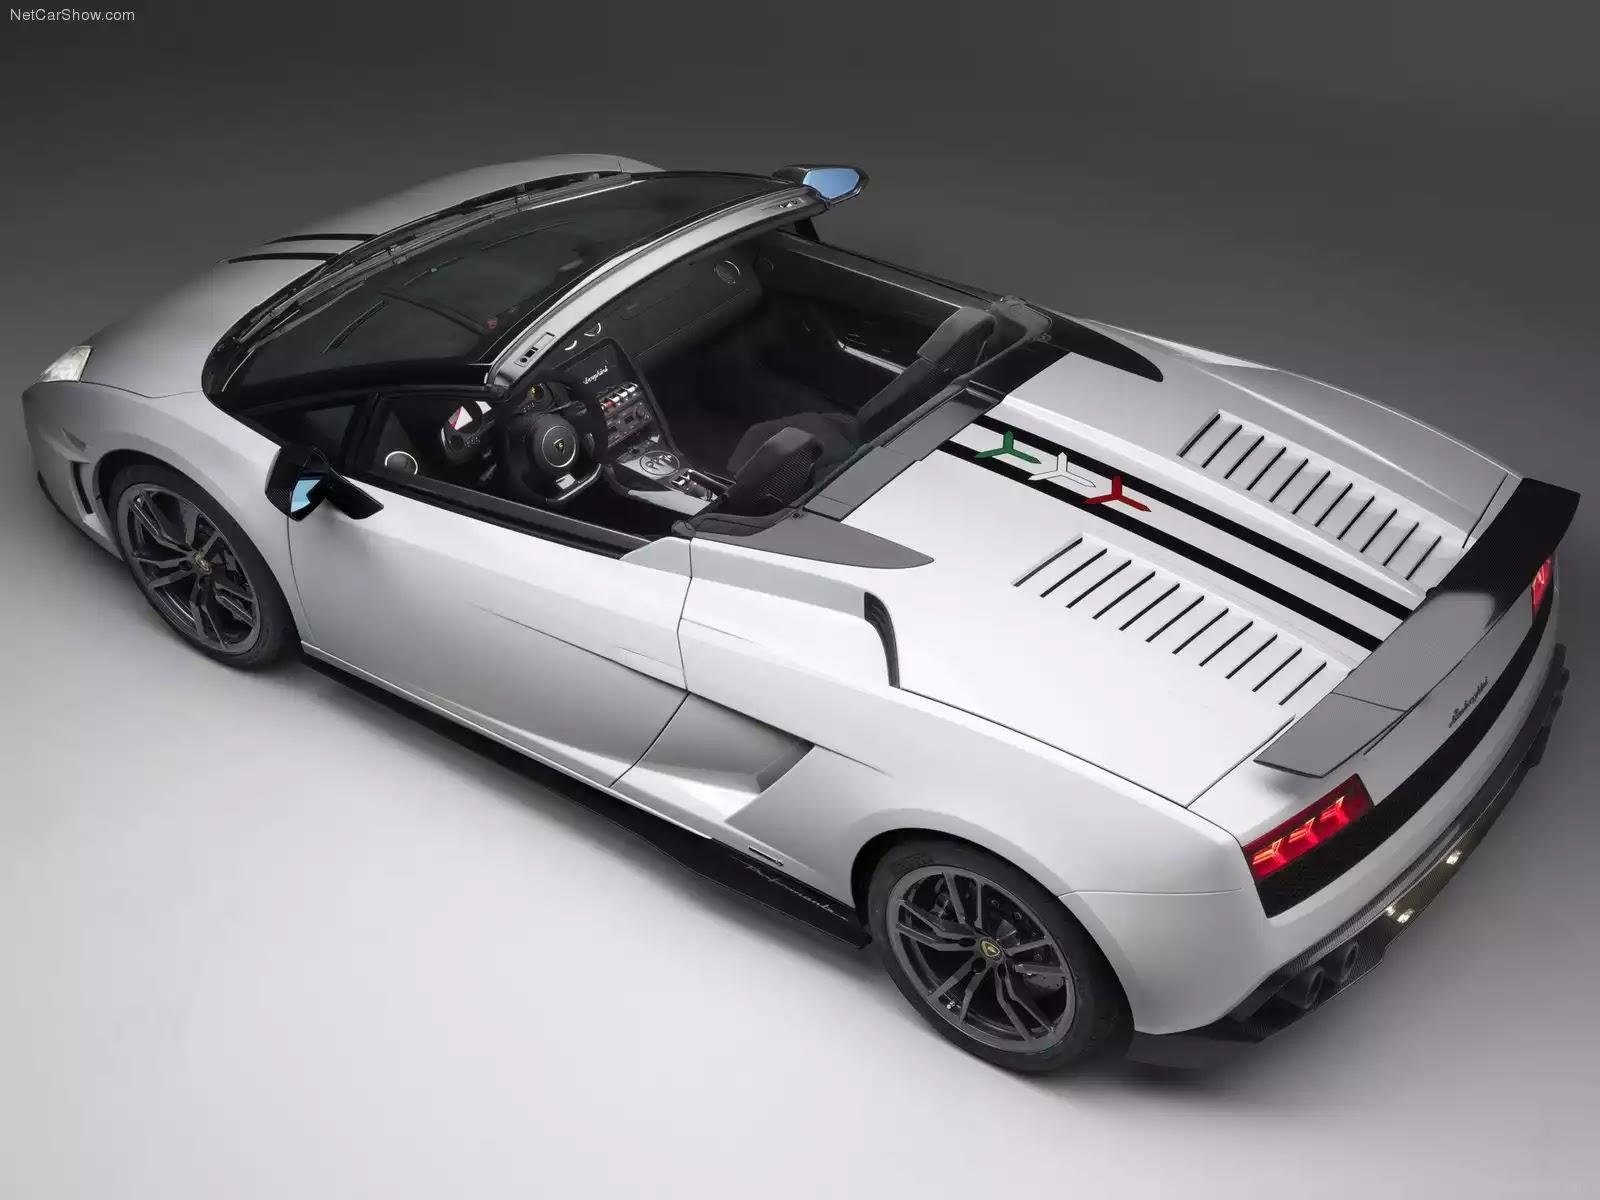 Hình ảnh siêu xe Lamborghini Gallardo LP570-4 Spyder Performante 2011 & nội ngoại thất